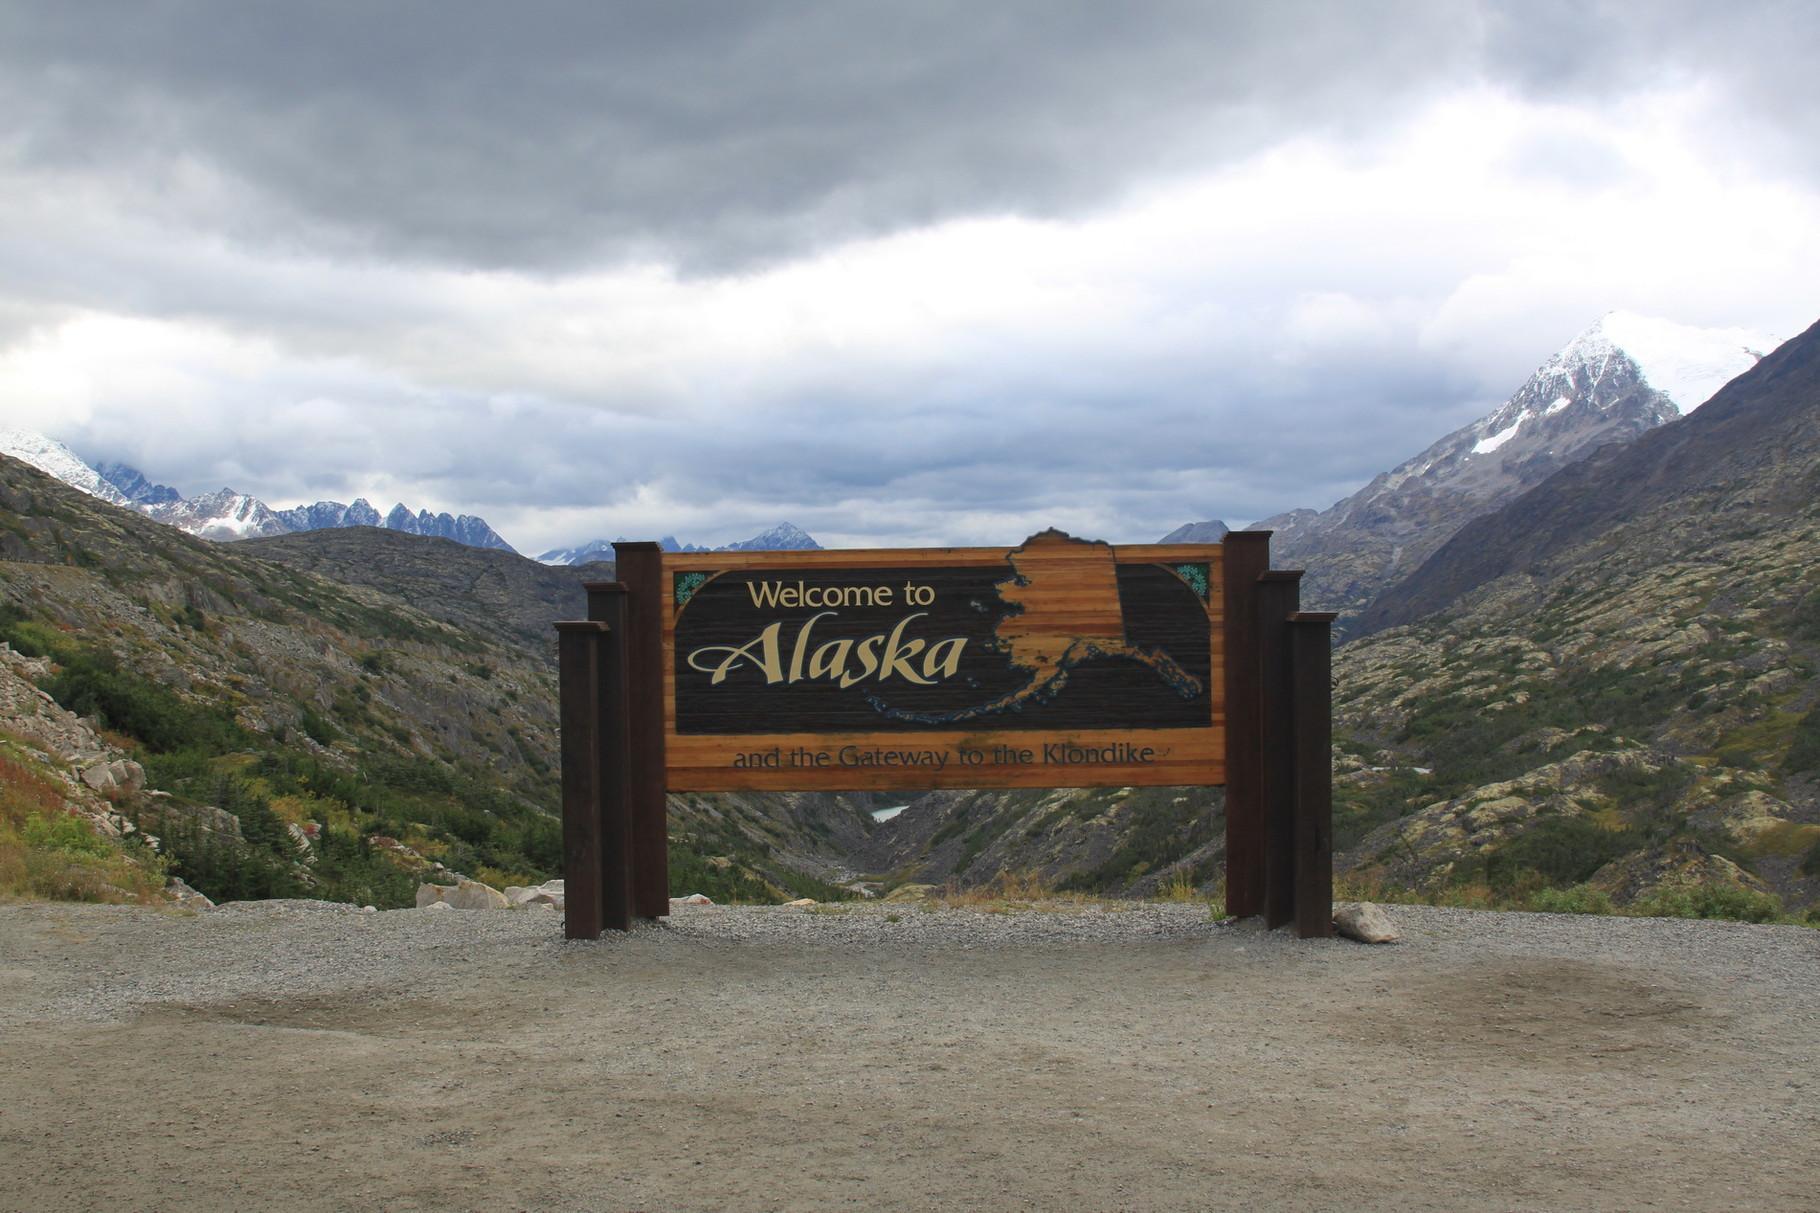 Rückfahrt aus Alaska auf der Passstrasse.